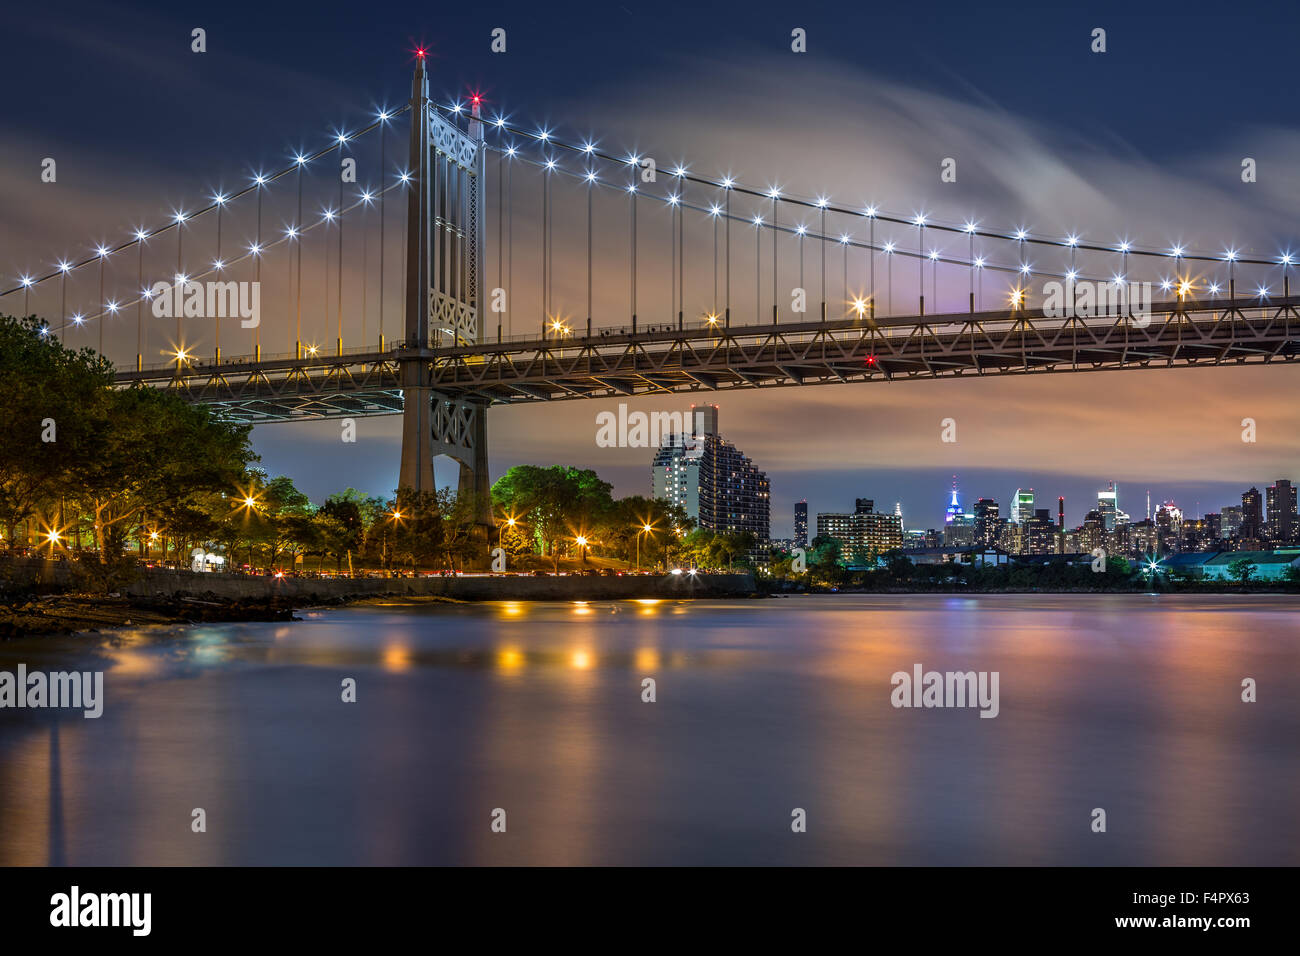 Triboro Bridge by night in Astoria, Queens, New York - Stock Image